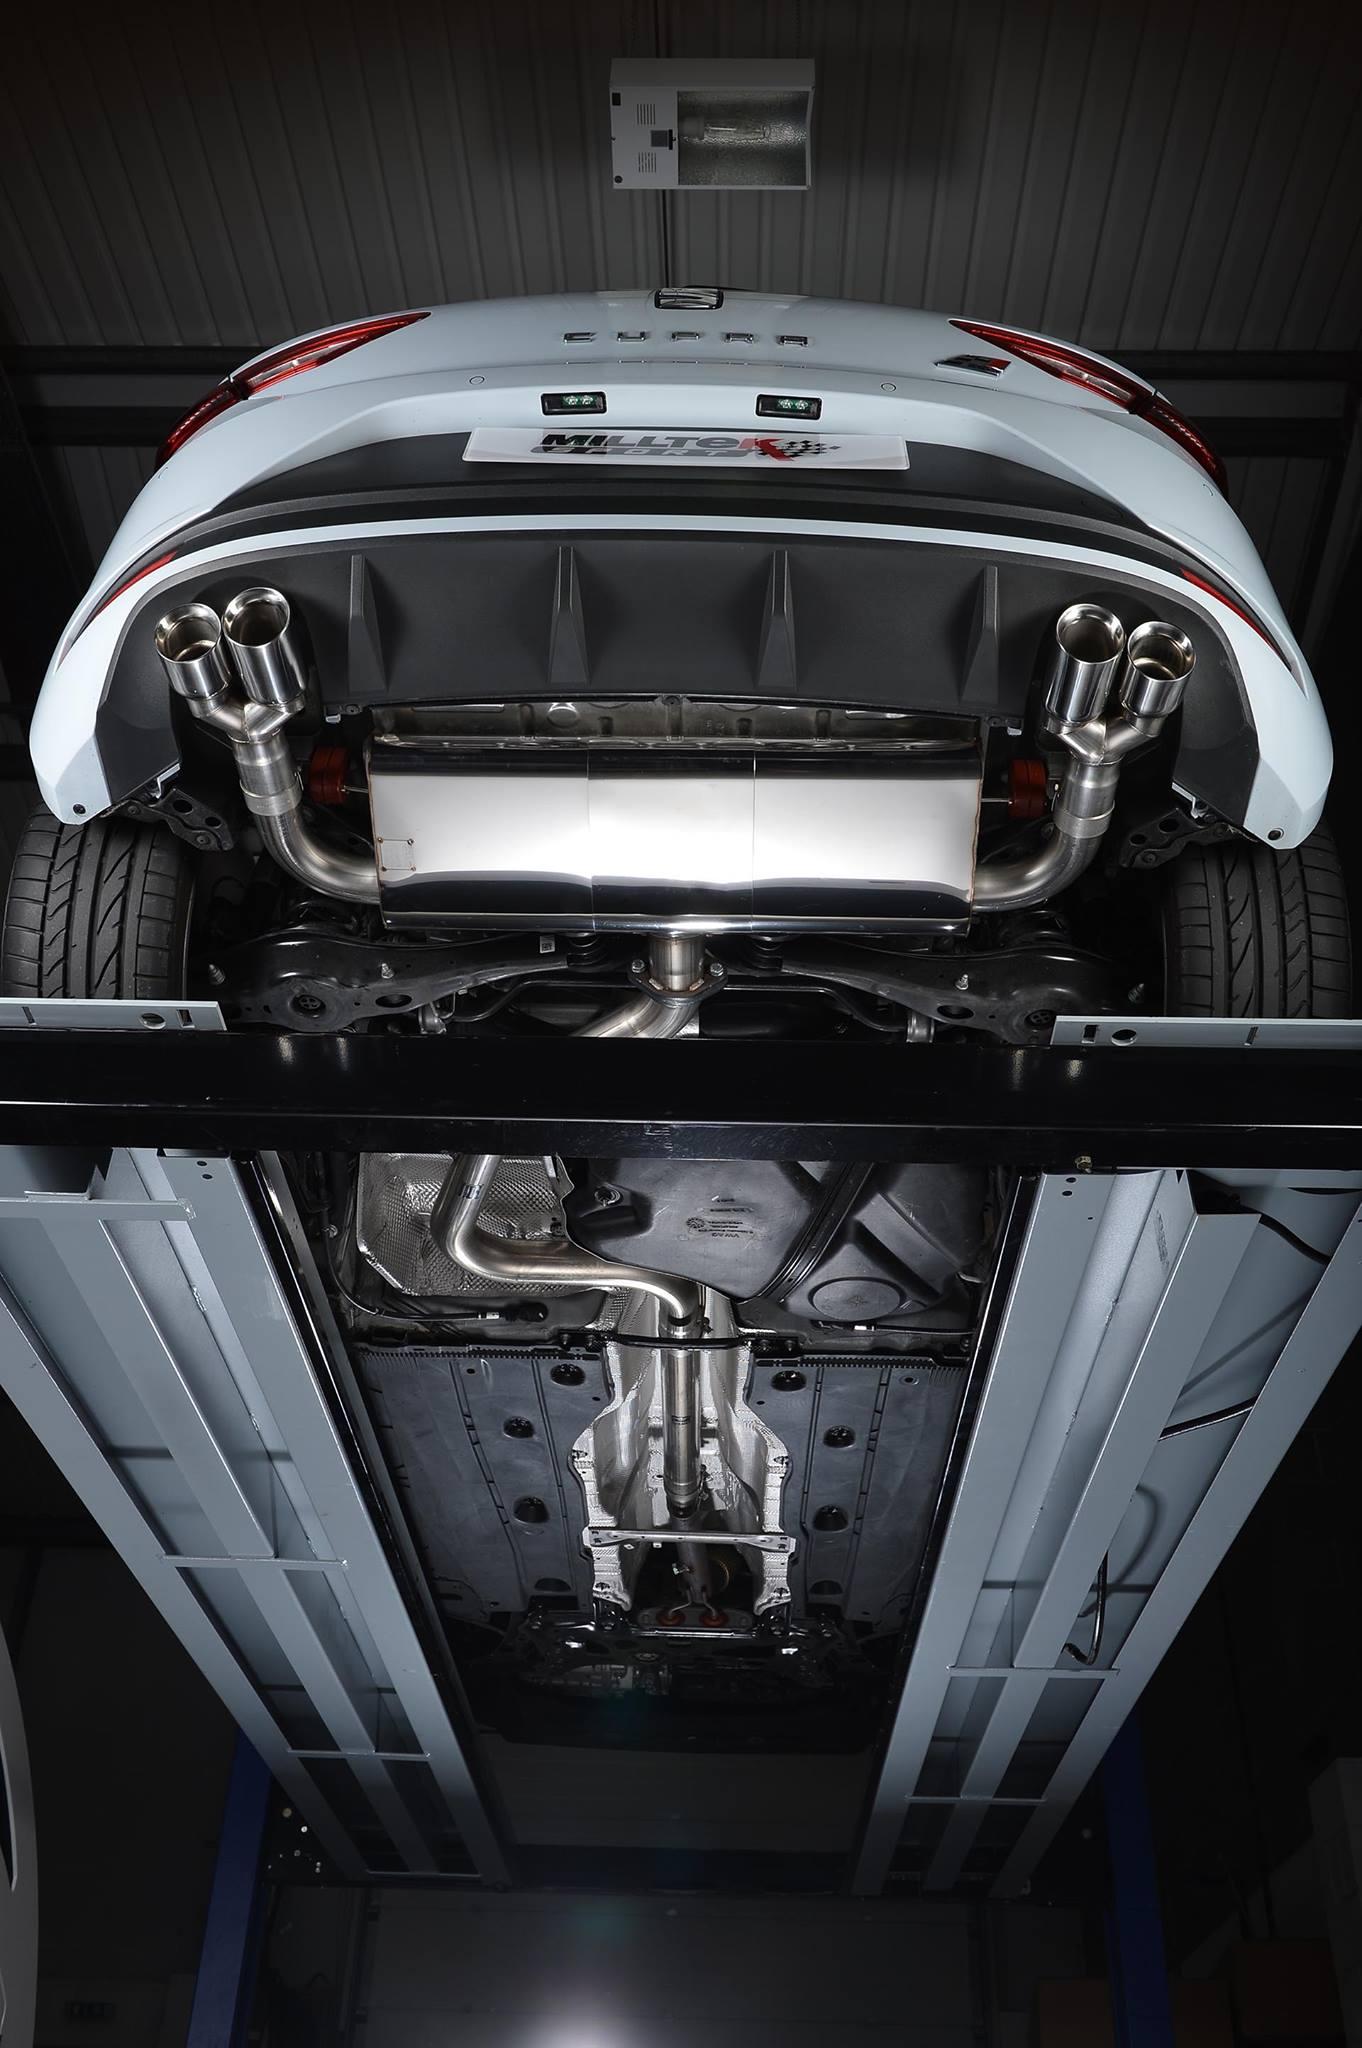 Seat Leon Cupra 280 Ps Gets Milltek Performance Exhaust